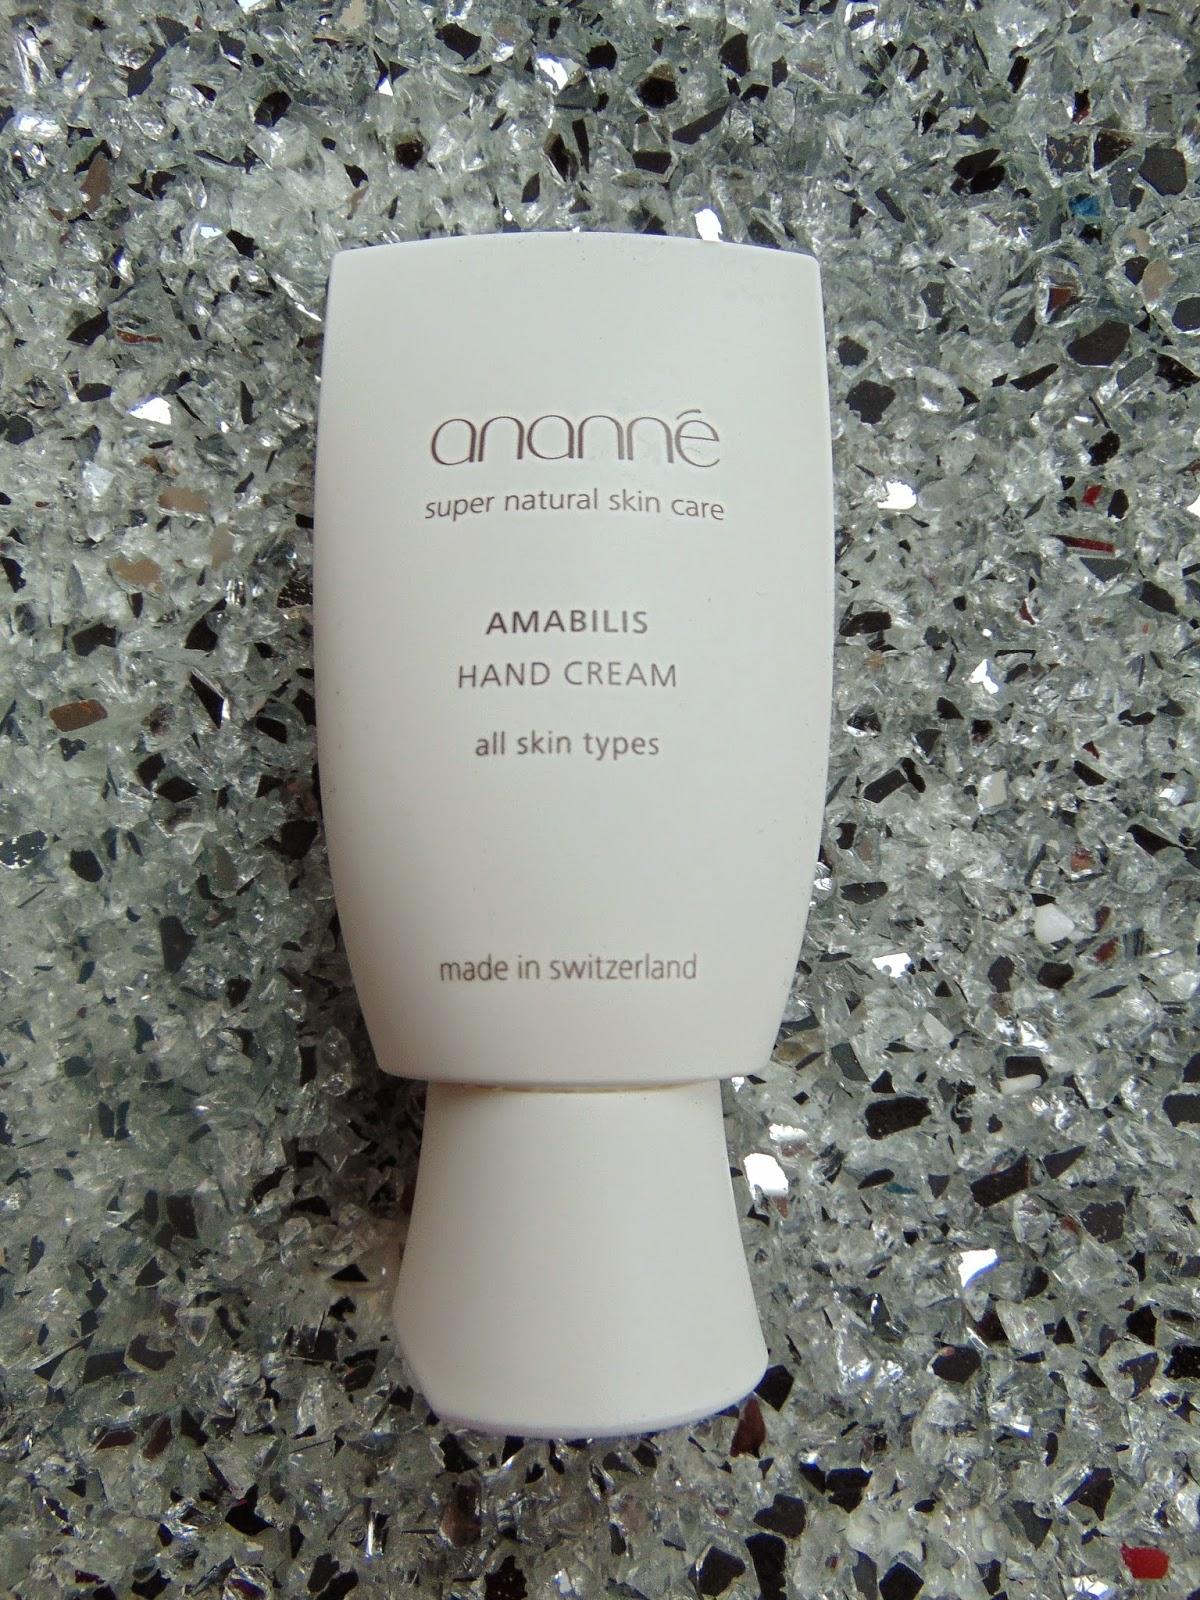 ananné Amabilis Hand Cream - www.annitschkasblog.de